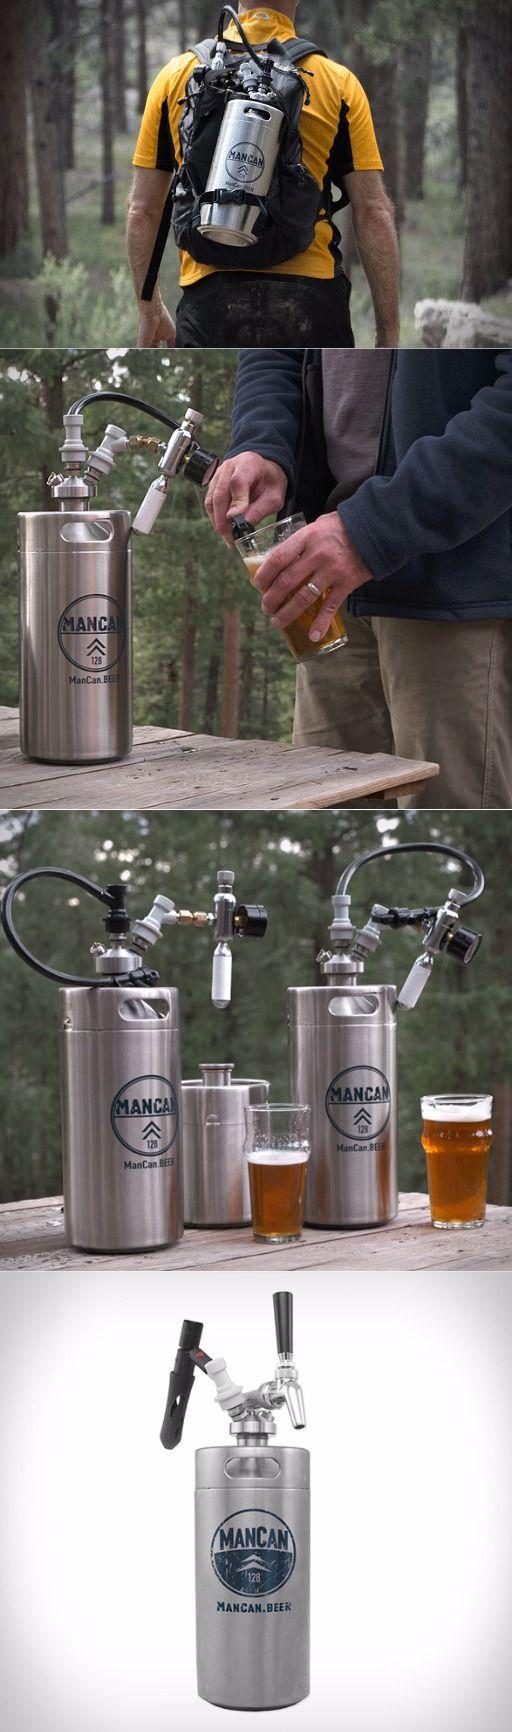 ManCan 128 Flex Kit with Perfect Pour Regulator